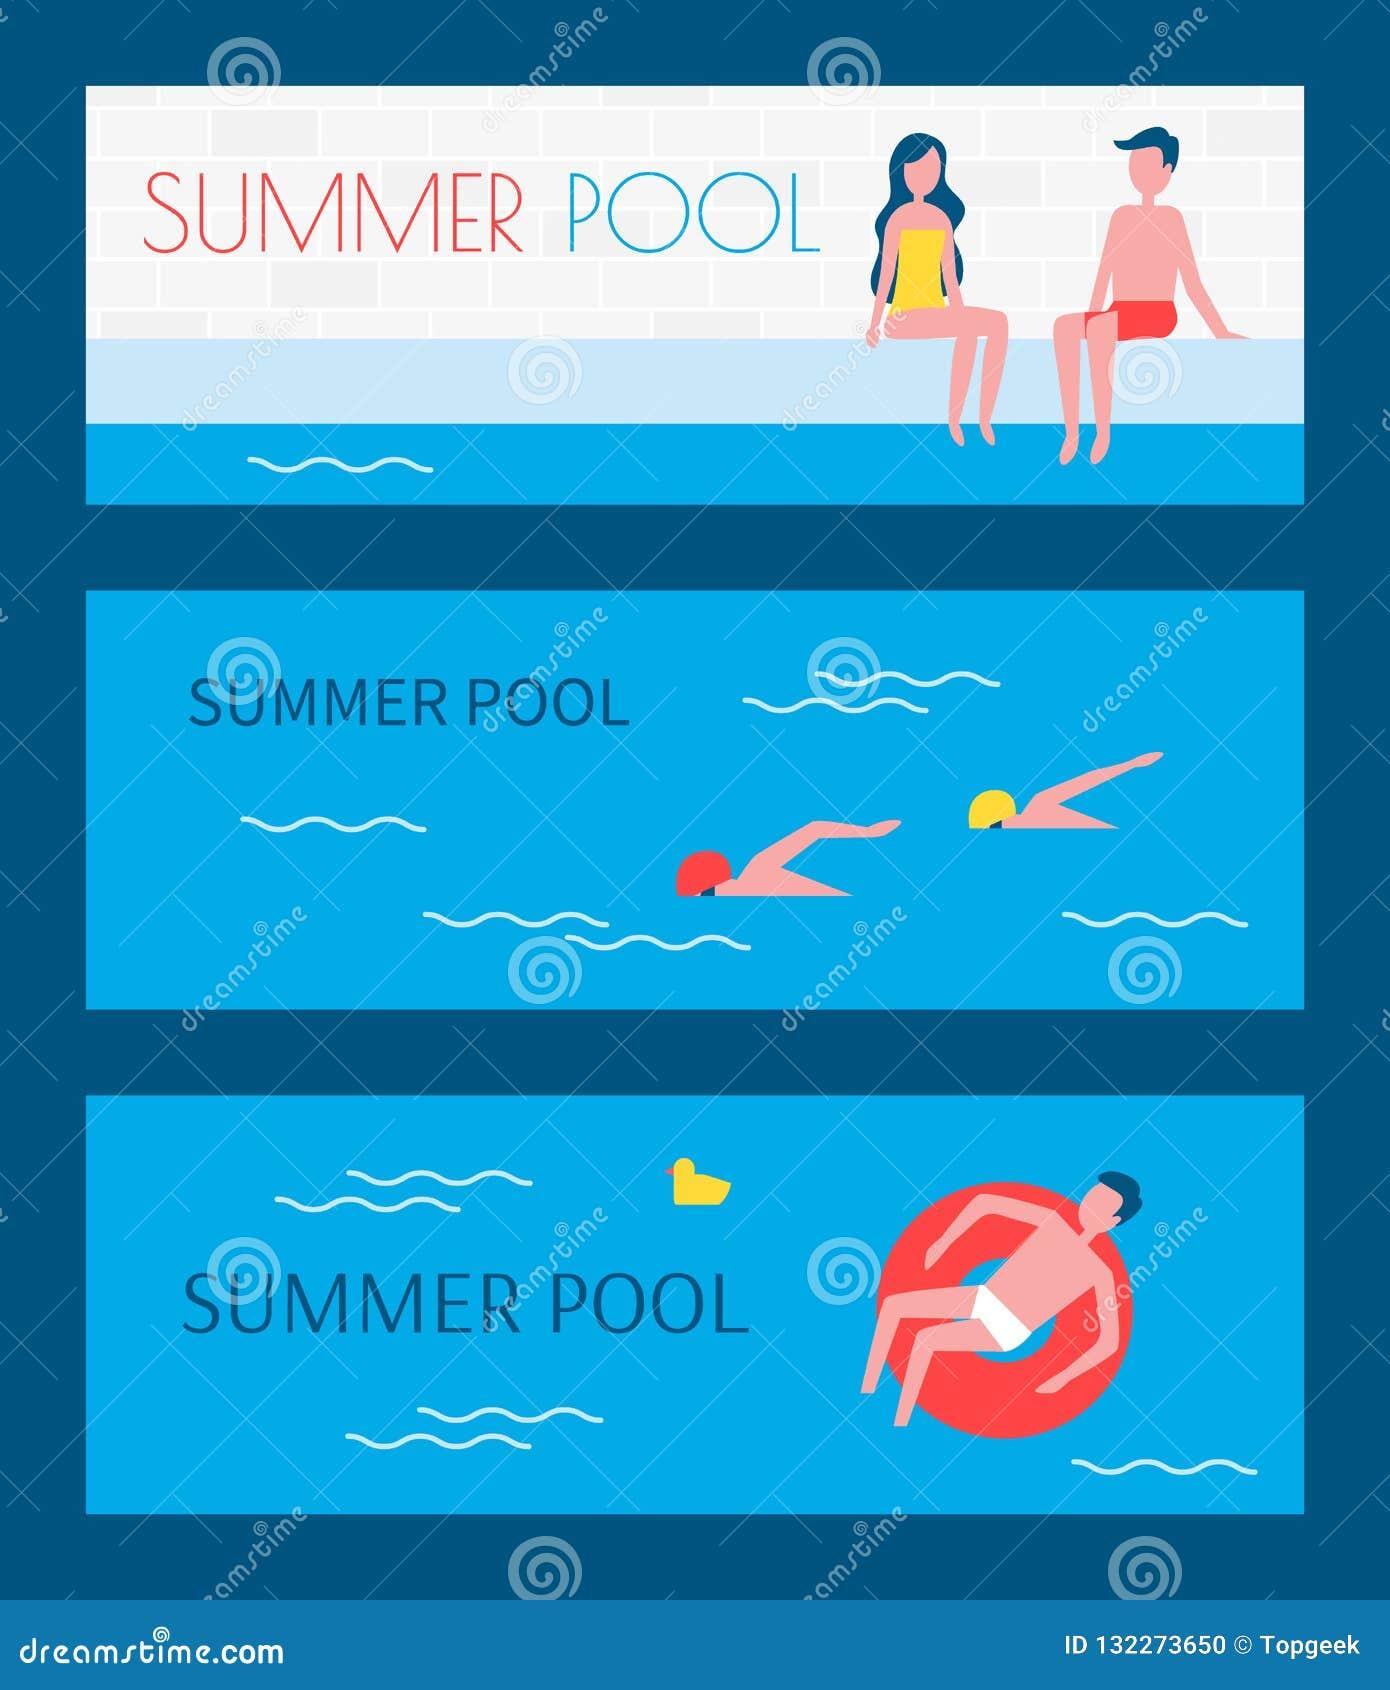 Summer Pool Swimming Basin Vector Illustration Stock Vector ...